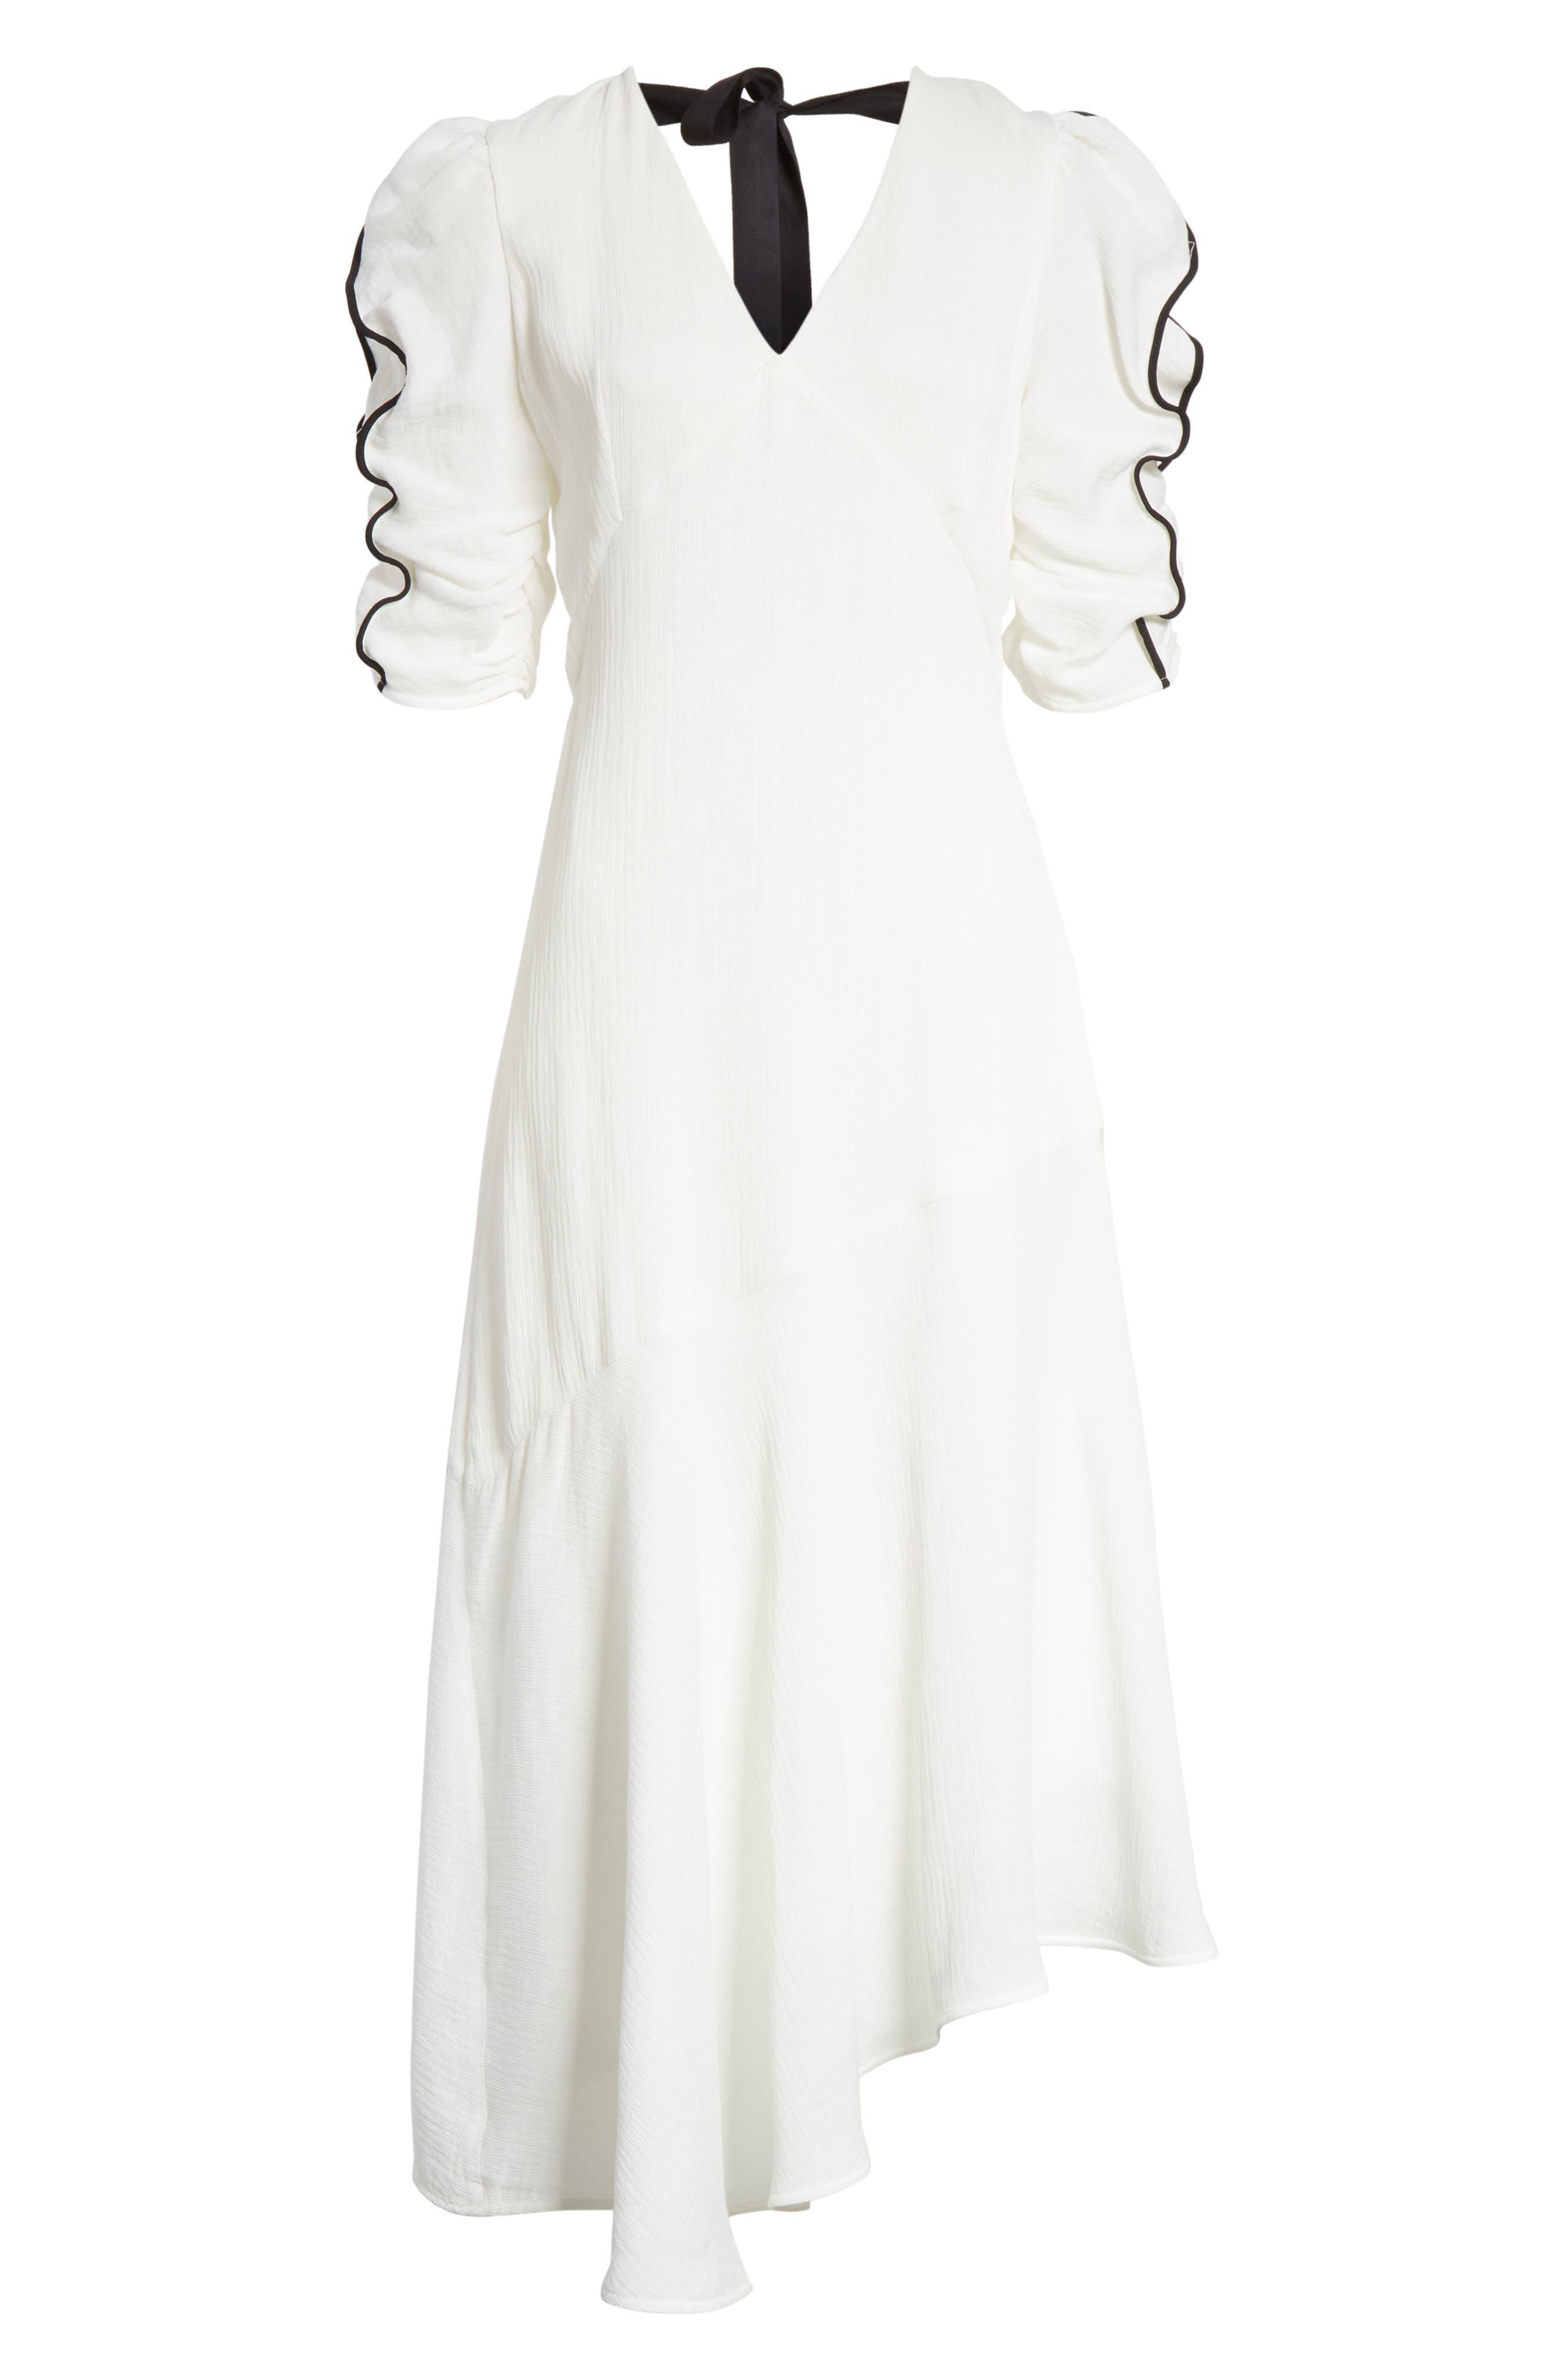 Prose & Poetry Shirley Ruffle Sleeve Midi Dress,                             Alternate thumbnail 6, color,                             101